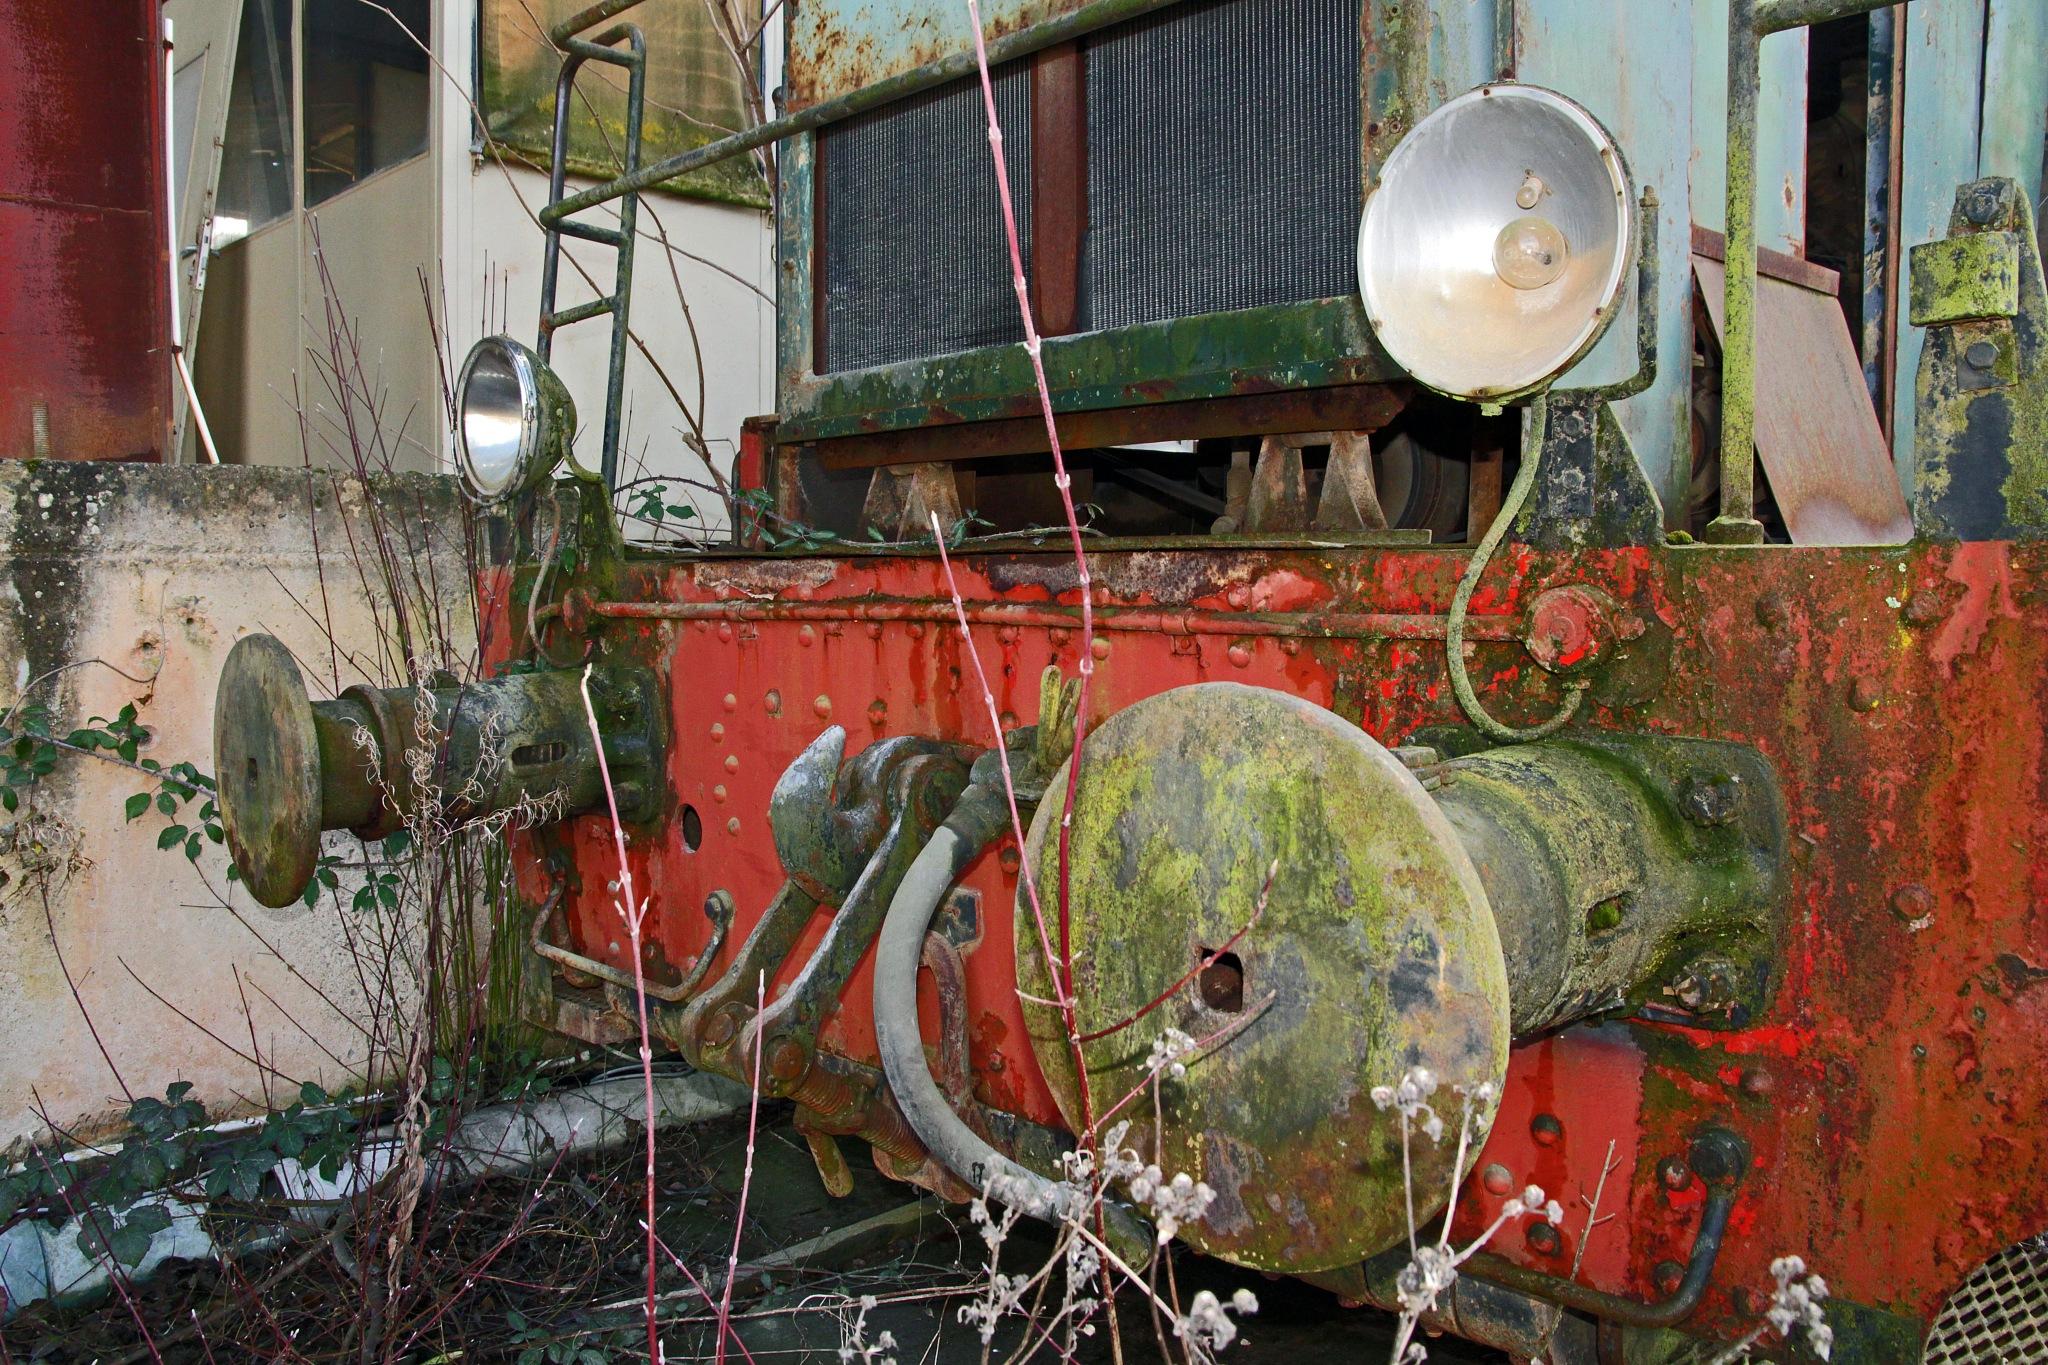 Old train retired by Jeroen Wouter van der Vlist